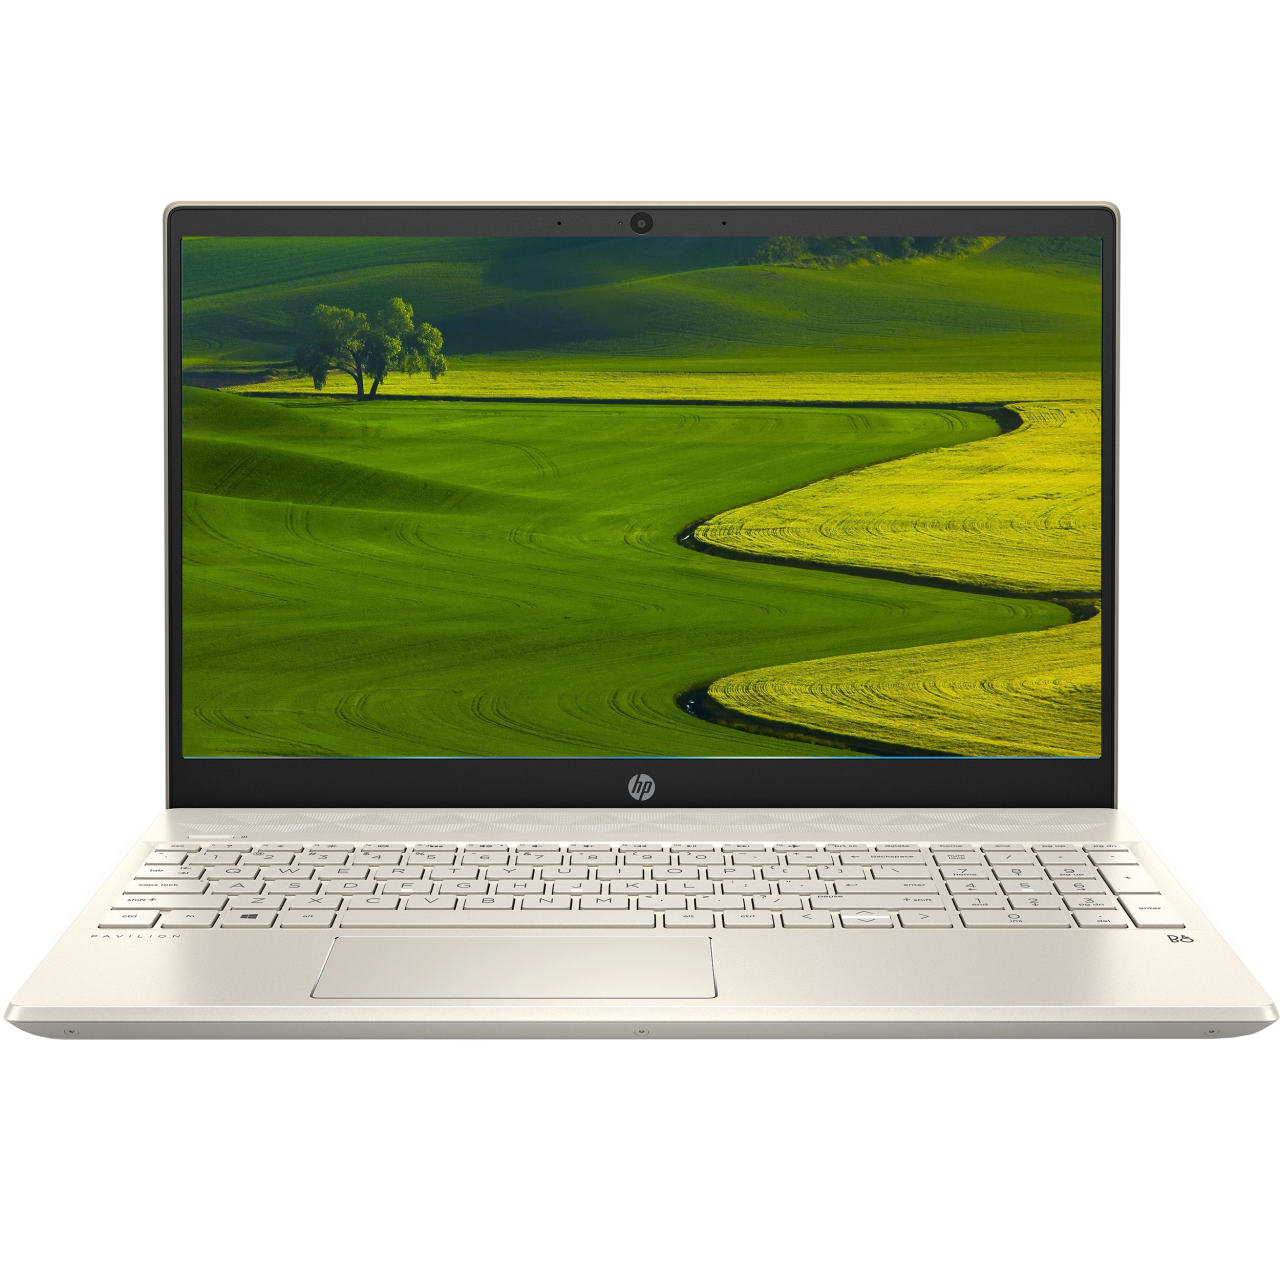 لپ تاپ ۱۵.۶ اینچی اچپی مدل Pavilion CS3458-A